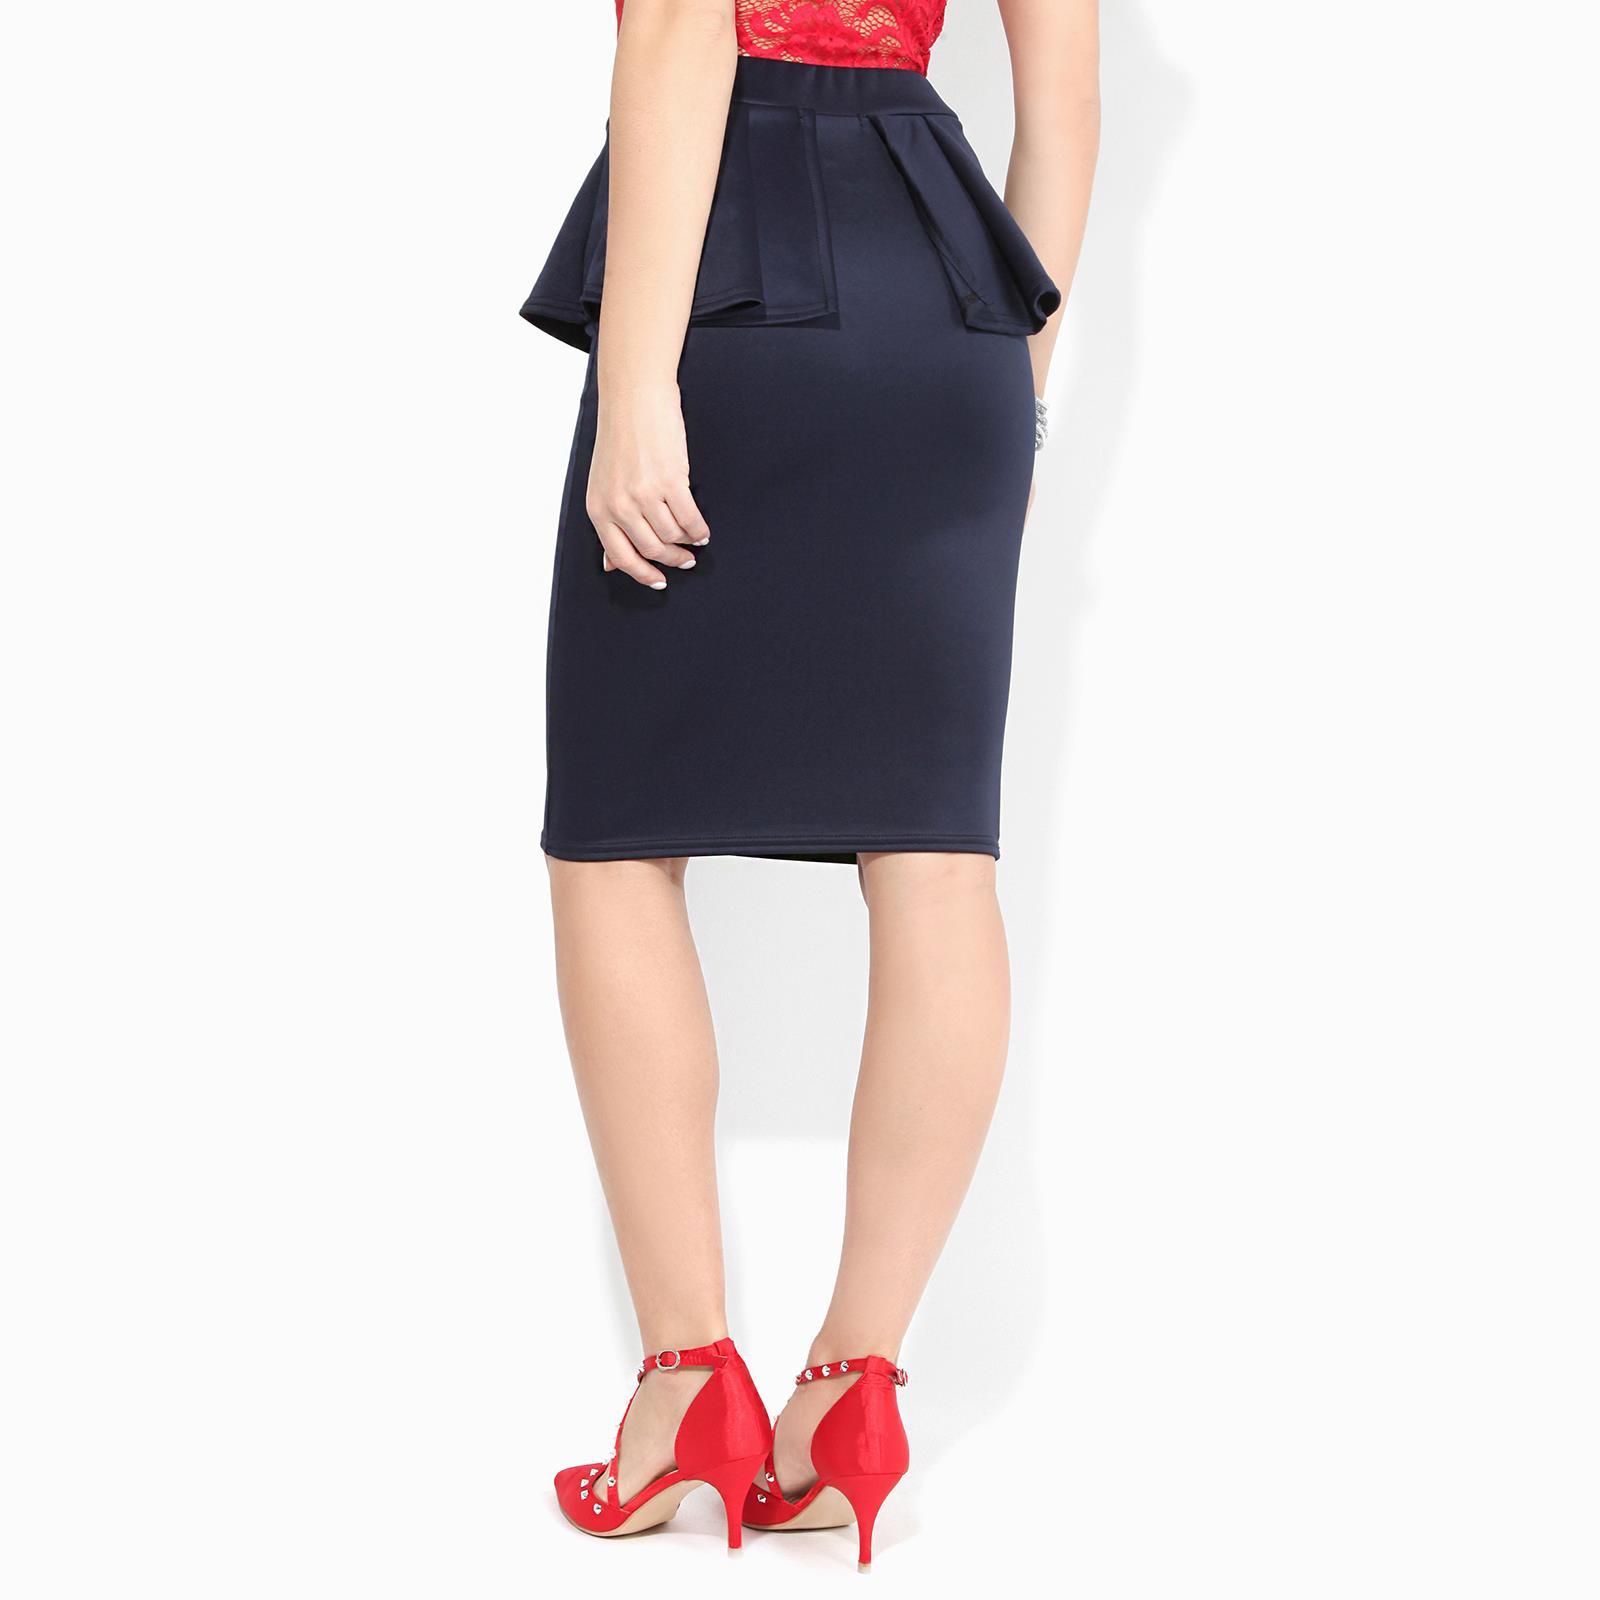 Women-Ladies-Peplum-Pencil-Midi-Skirt-Ruffle-Frill-Waist-Bodycon-Party-Office thumbnail 8